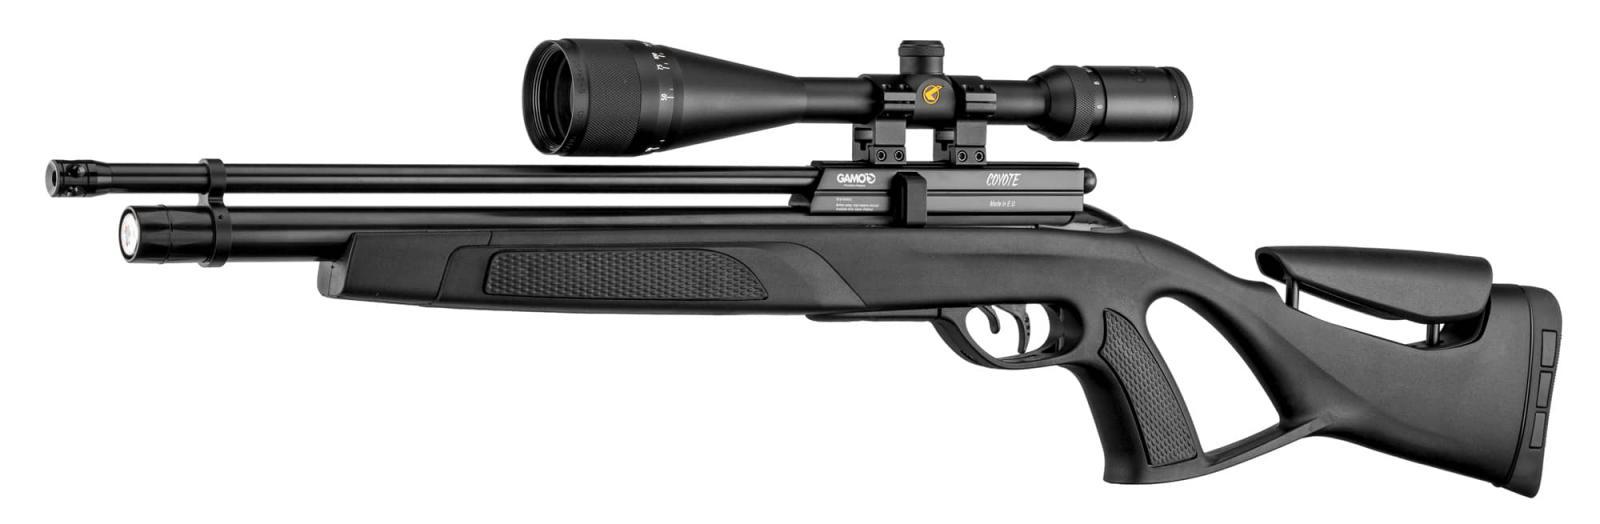 Pack Carabine GAMO COYOTE PCP calibre 5.5 + Lunette 6-24x50 + Pompe + Plombs